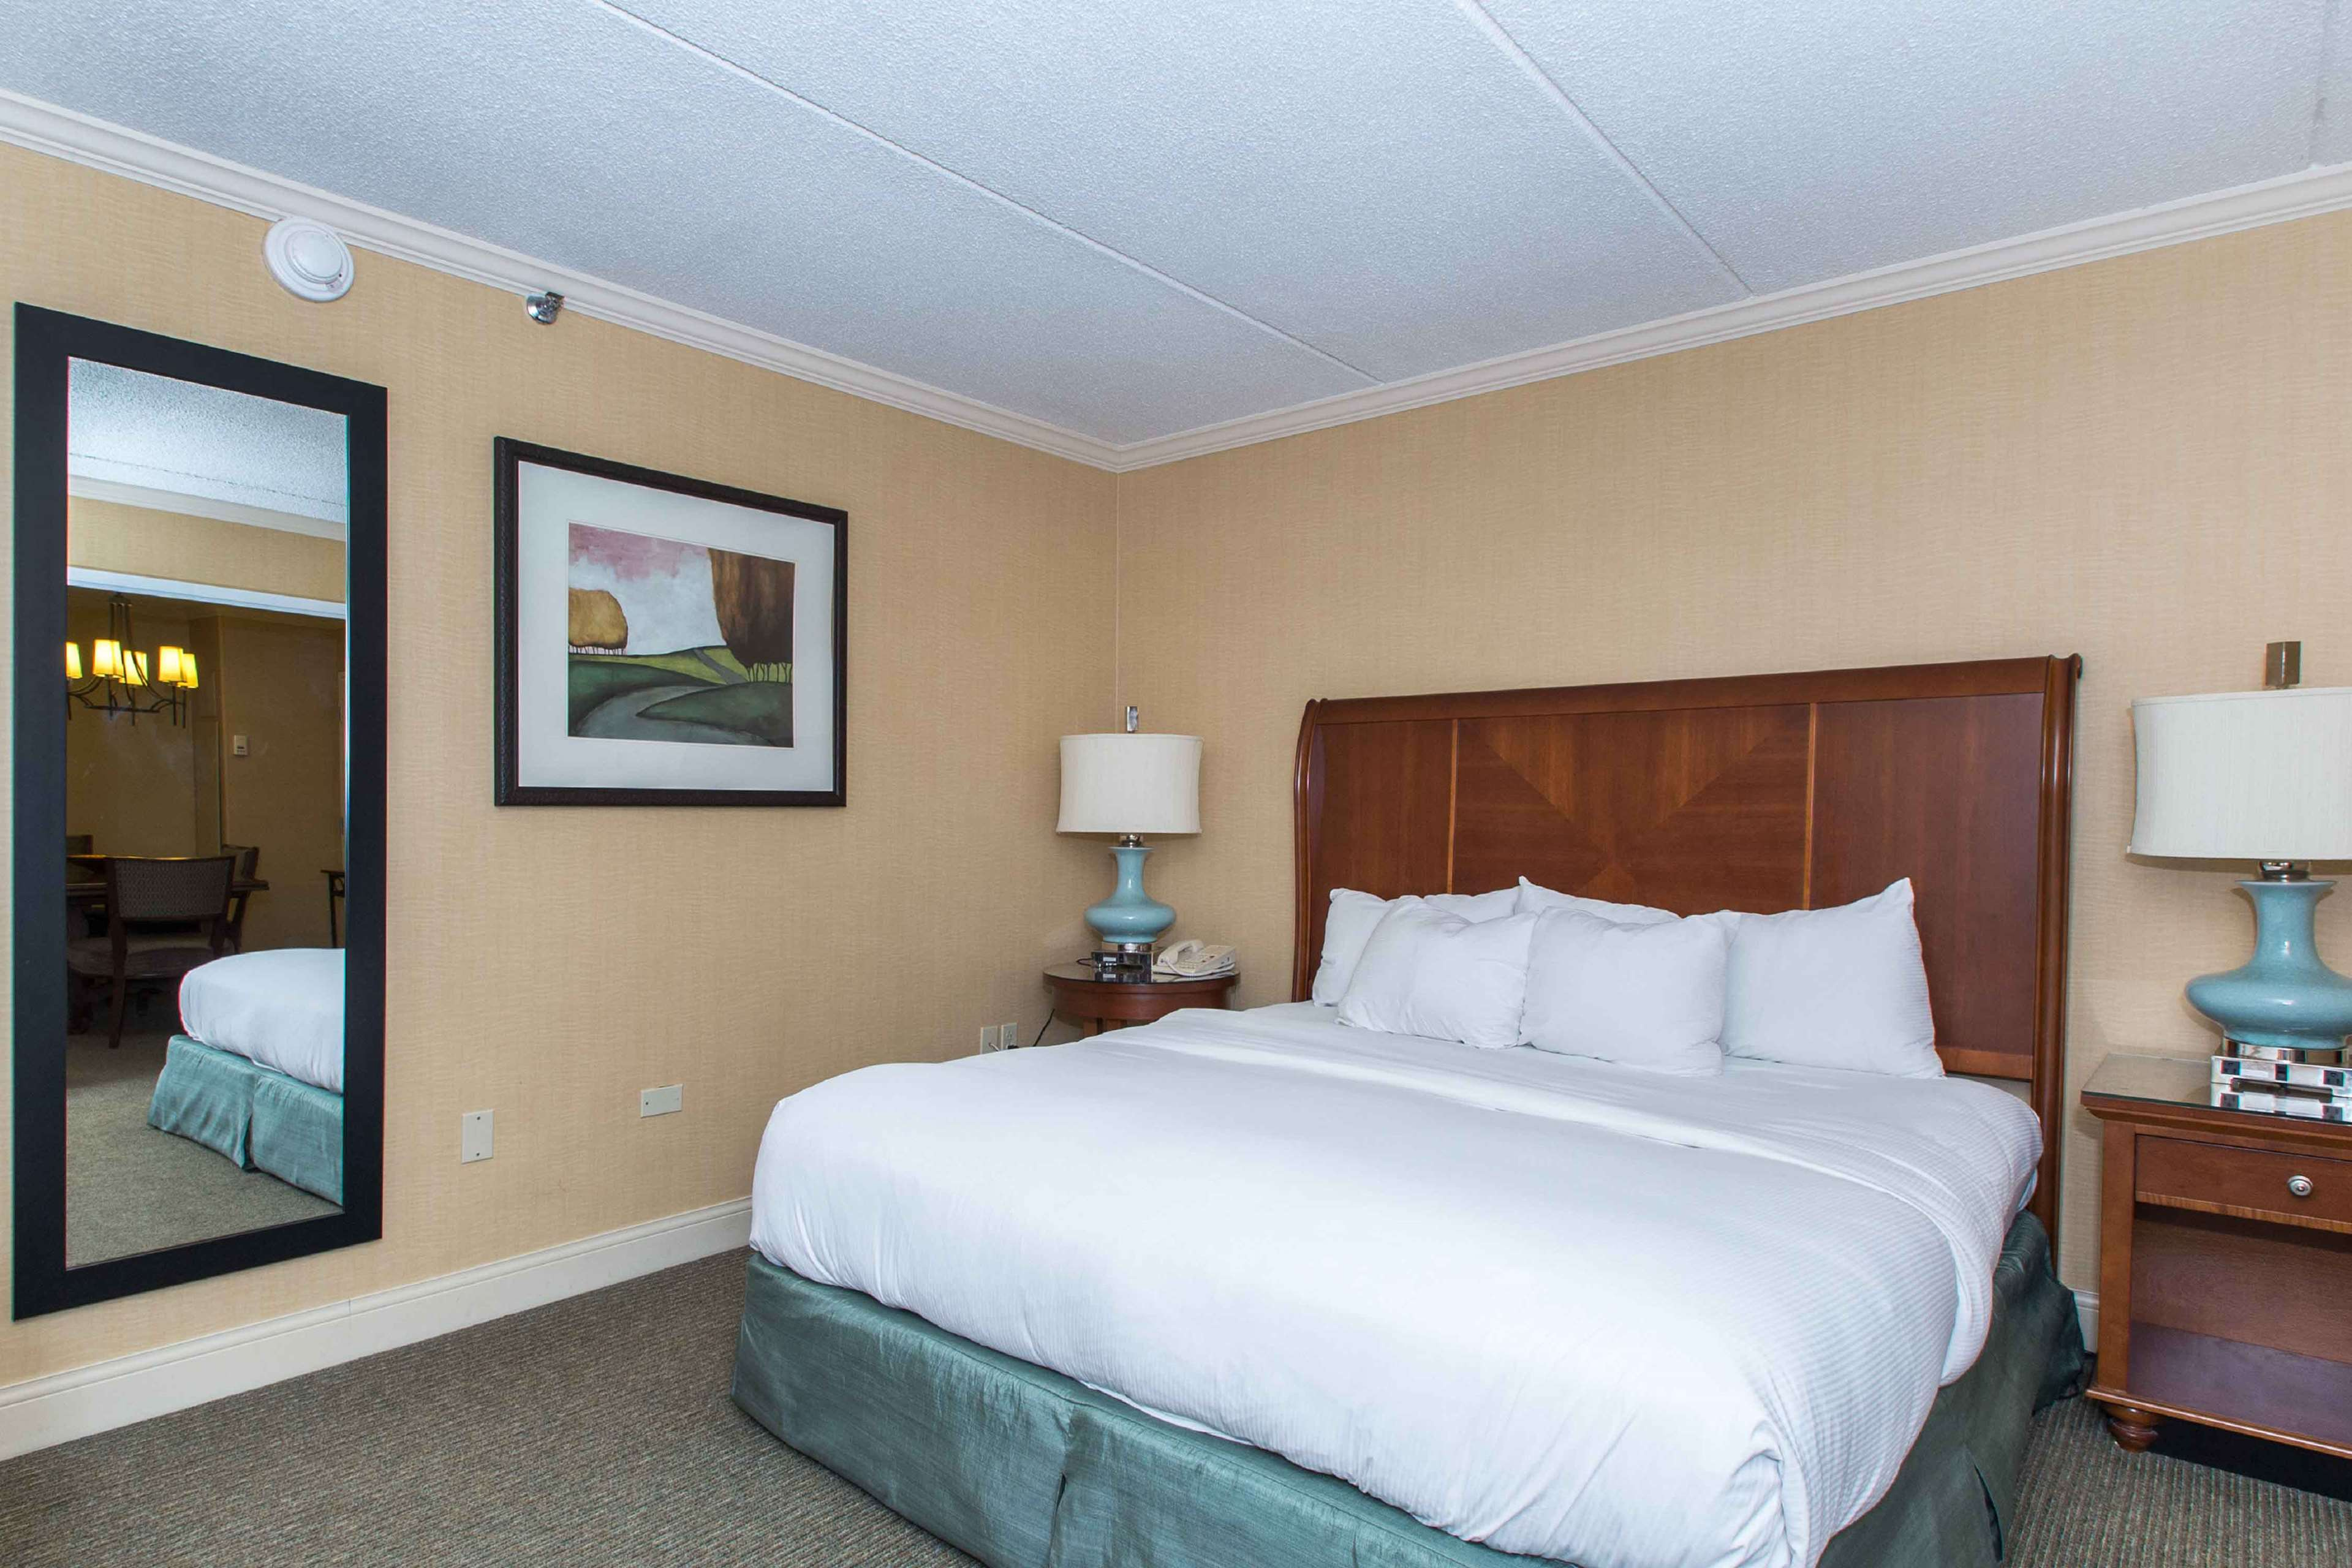 DoubleTree by Hilton Hotel Cleveland East Beachwood image 39